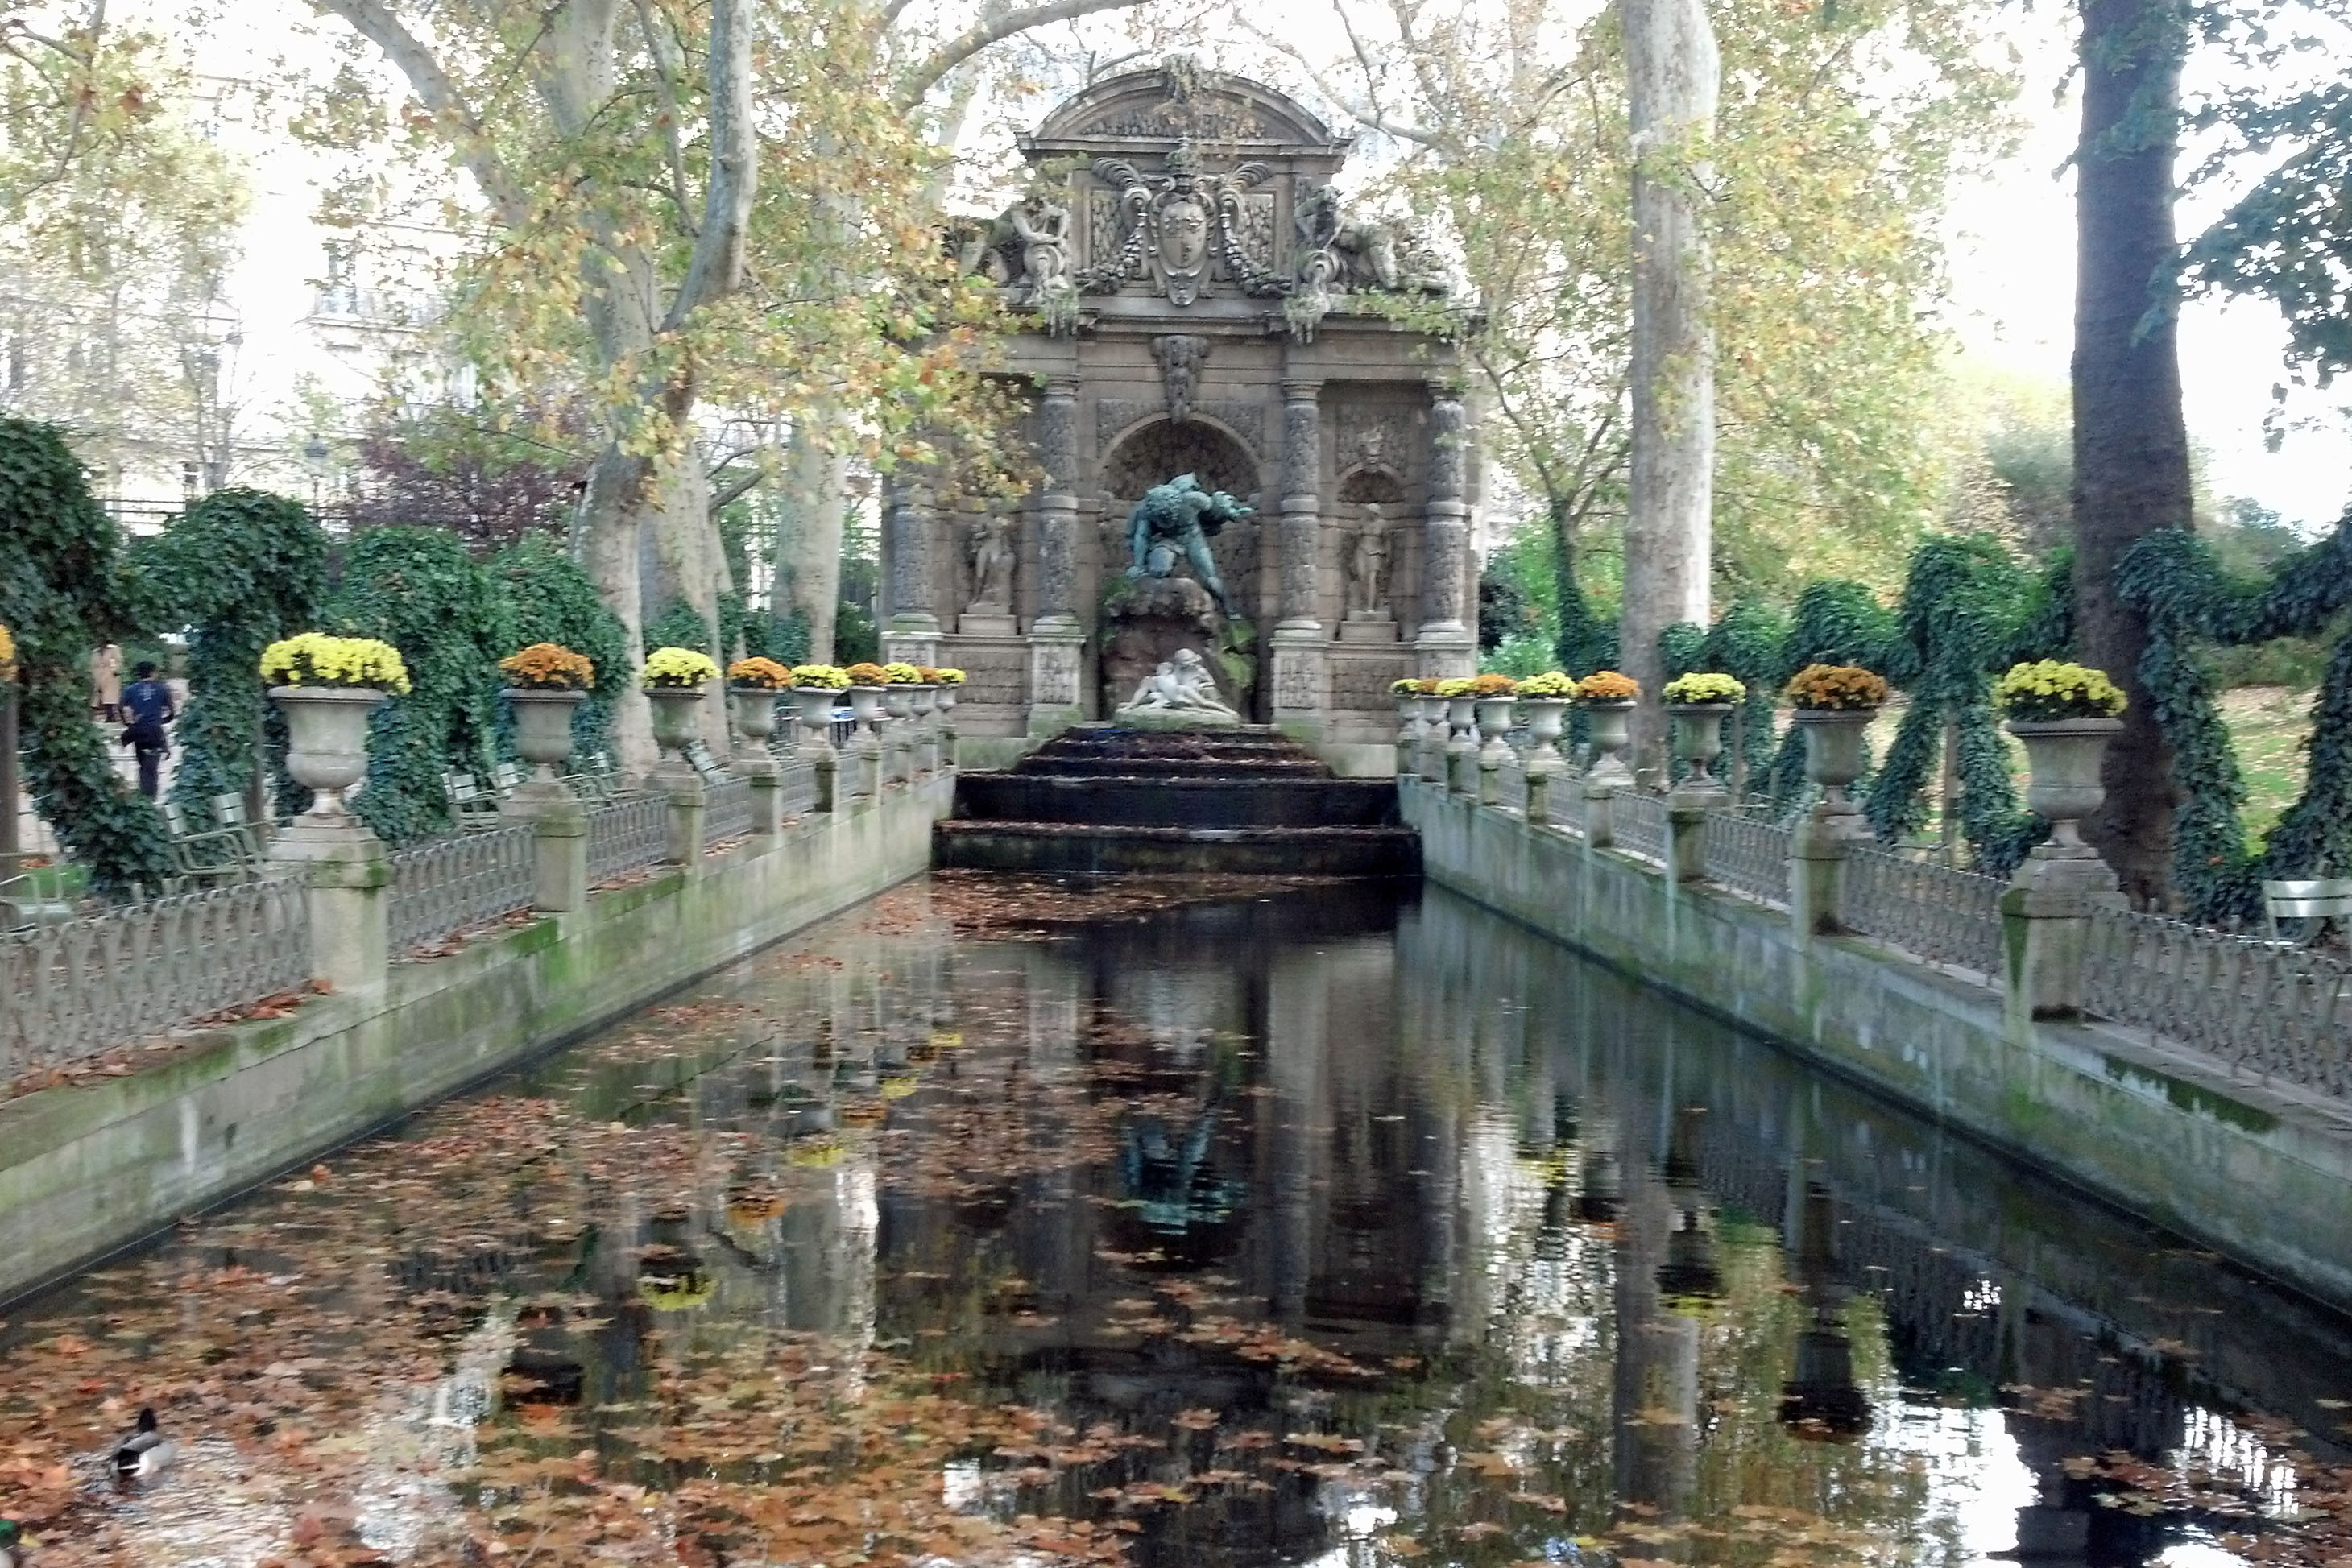 luxemburg gardens water